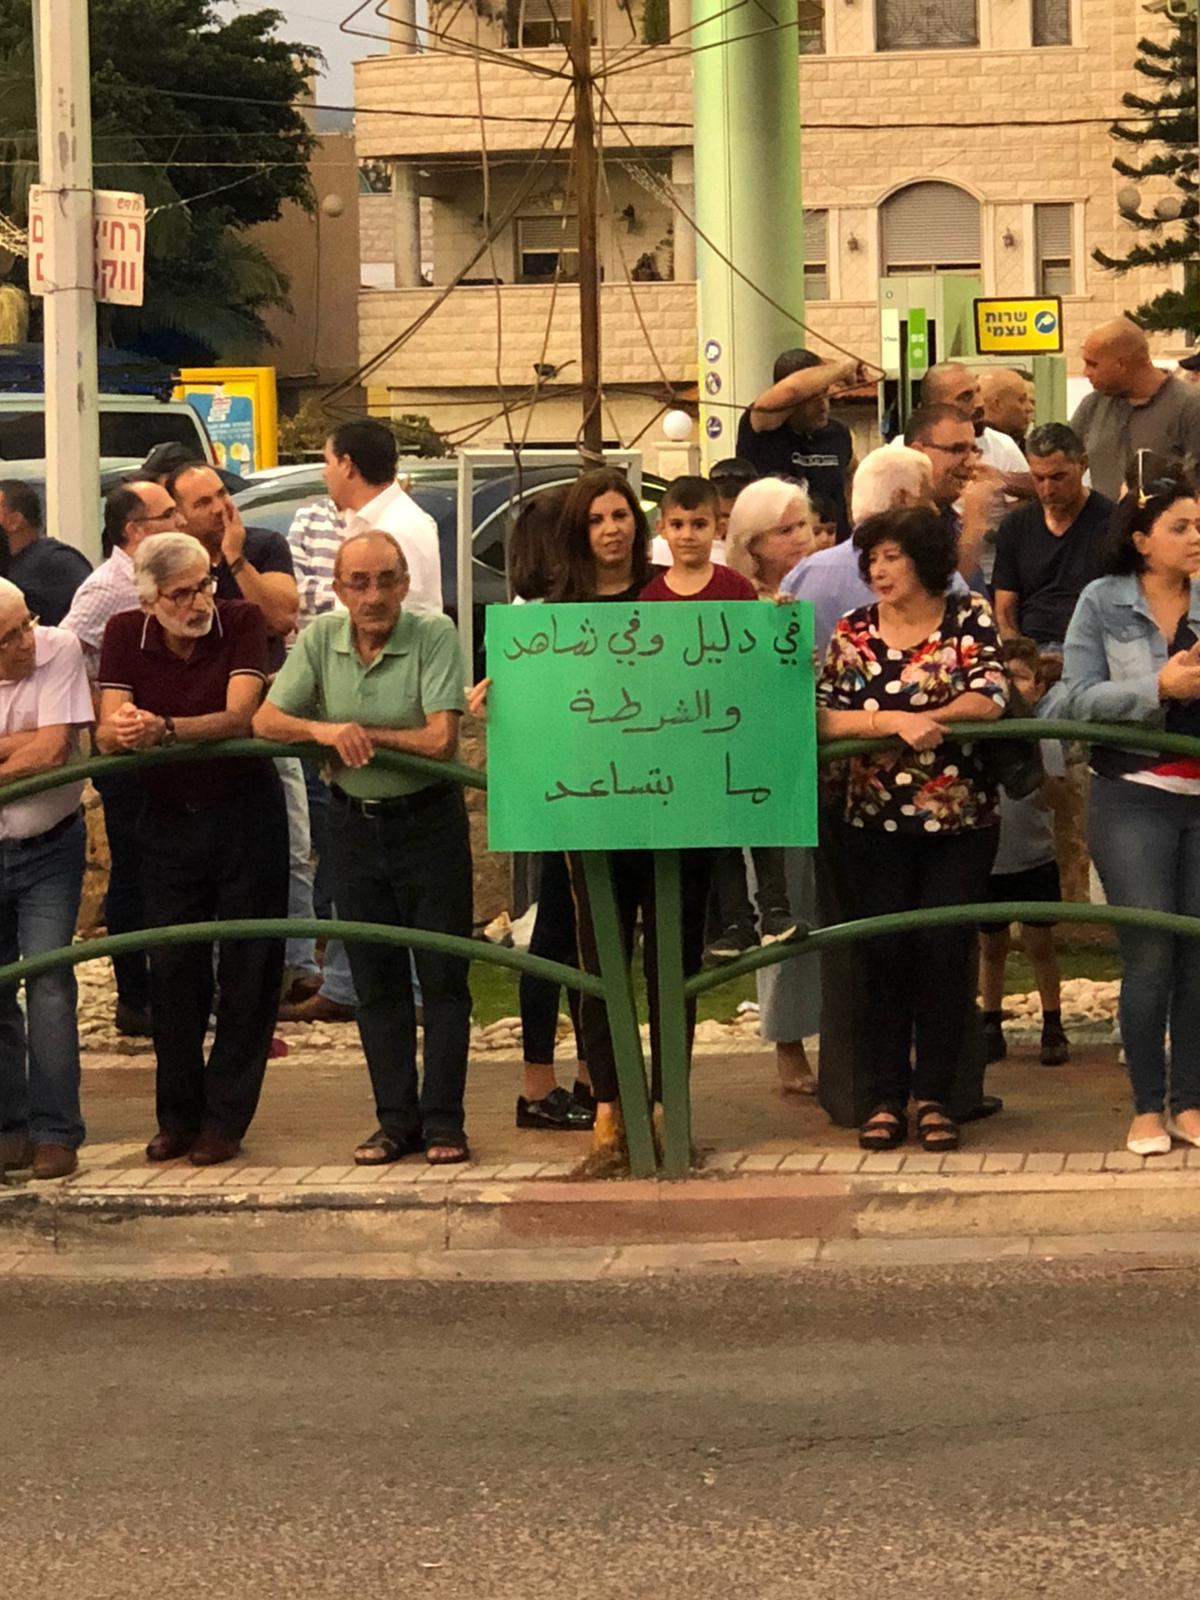 Photo of مظاهره استنكار للاعتداء على رئيس مجلس كفرياسيف